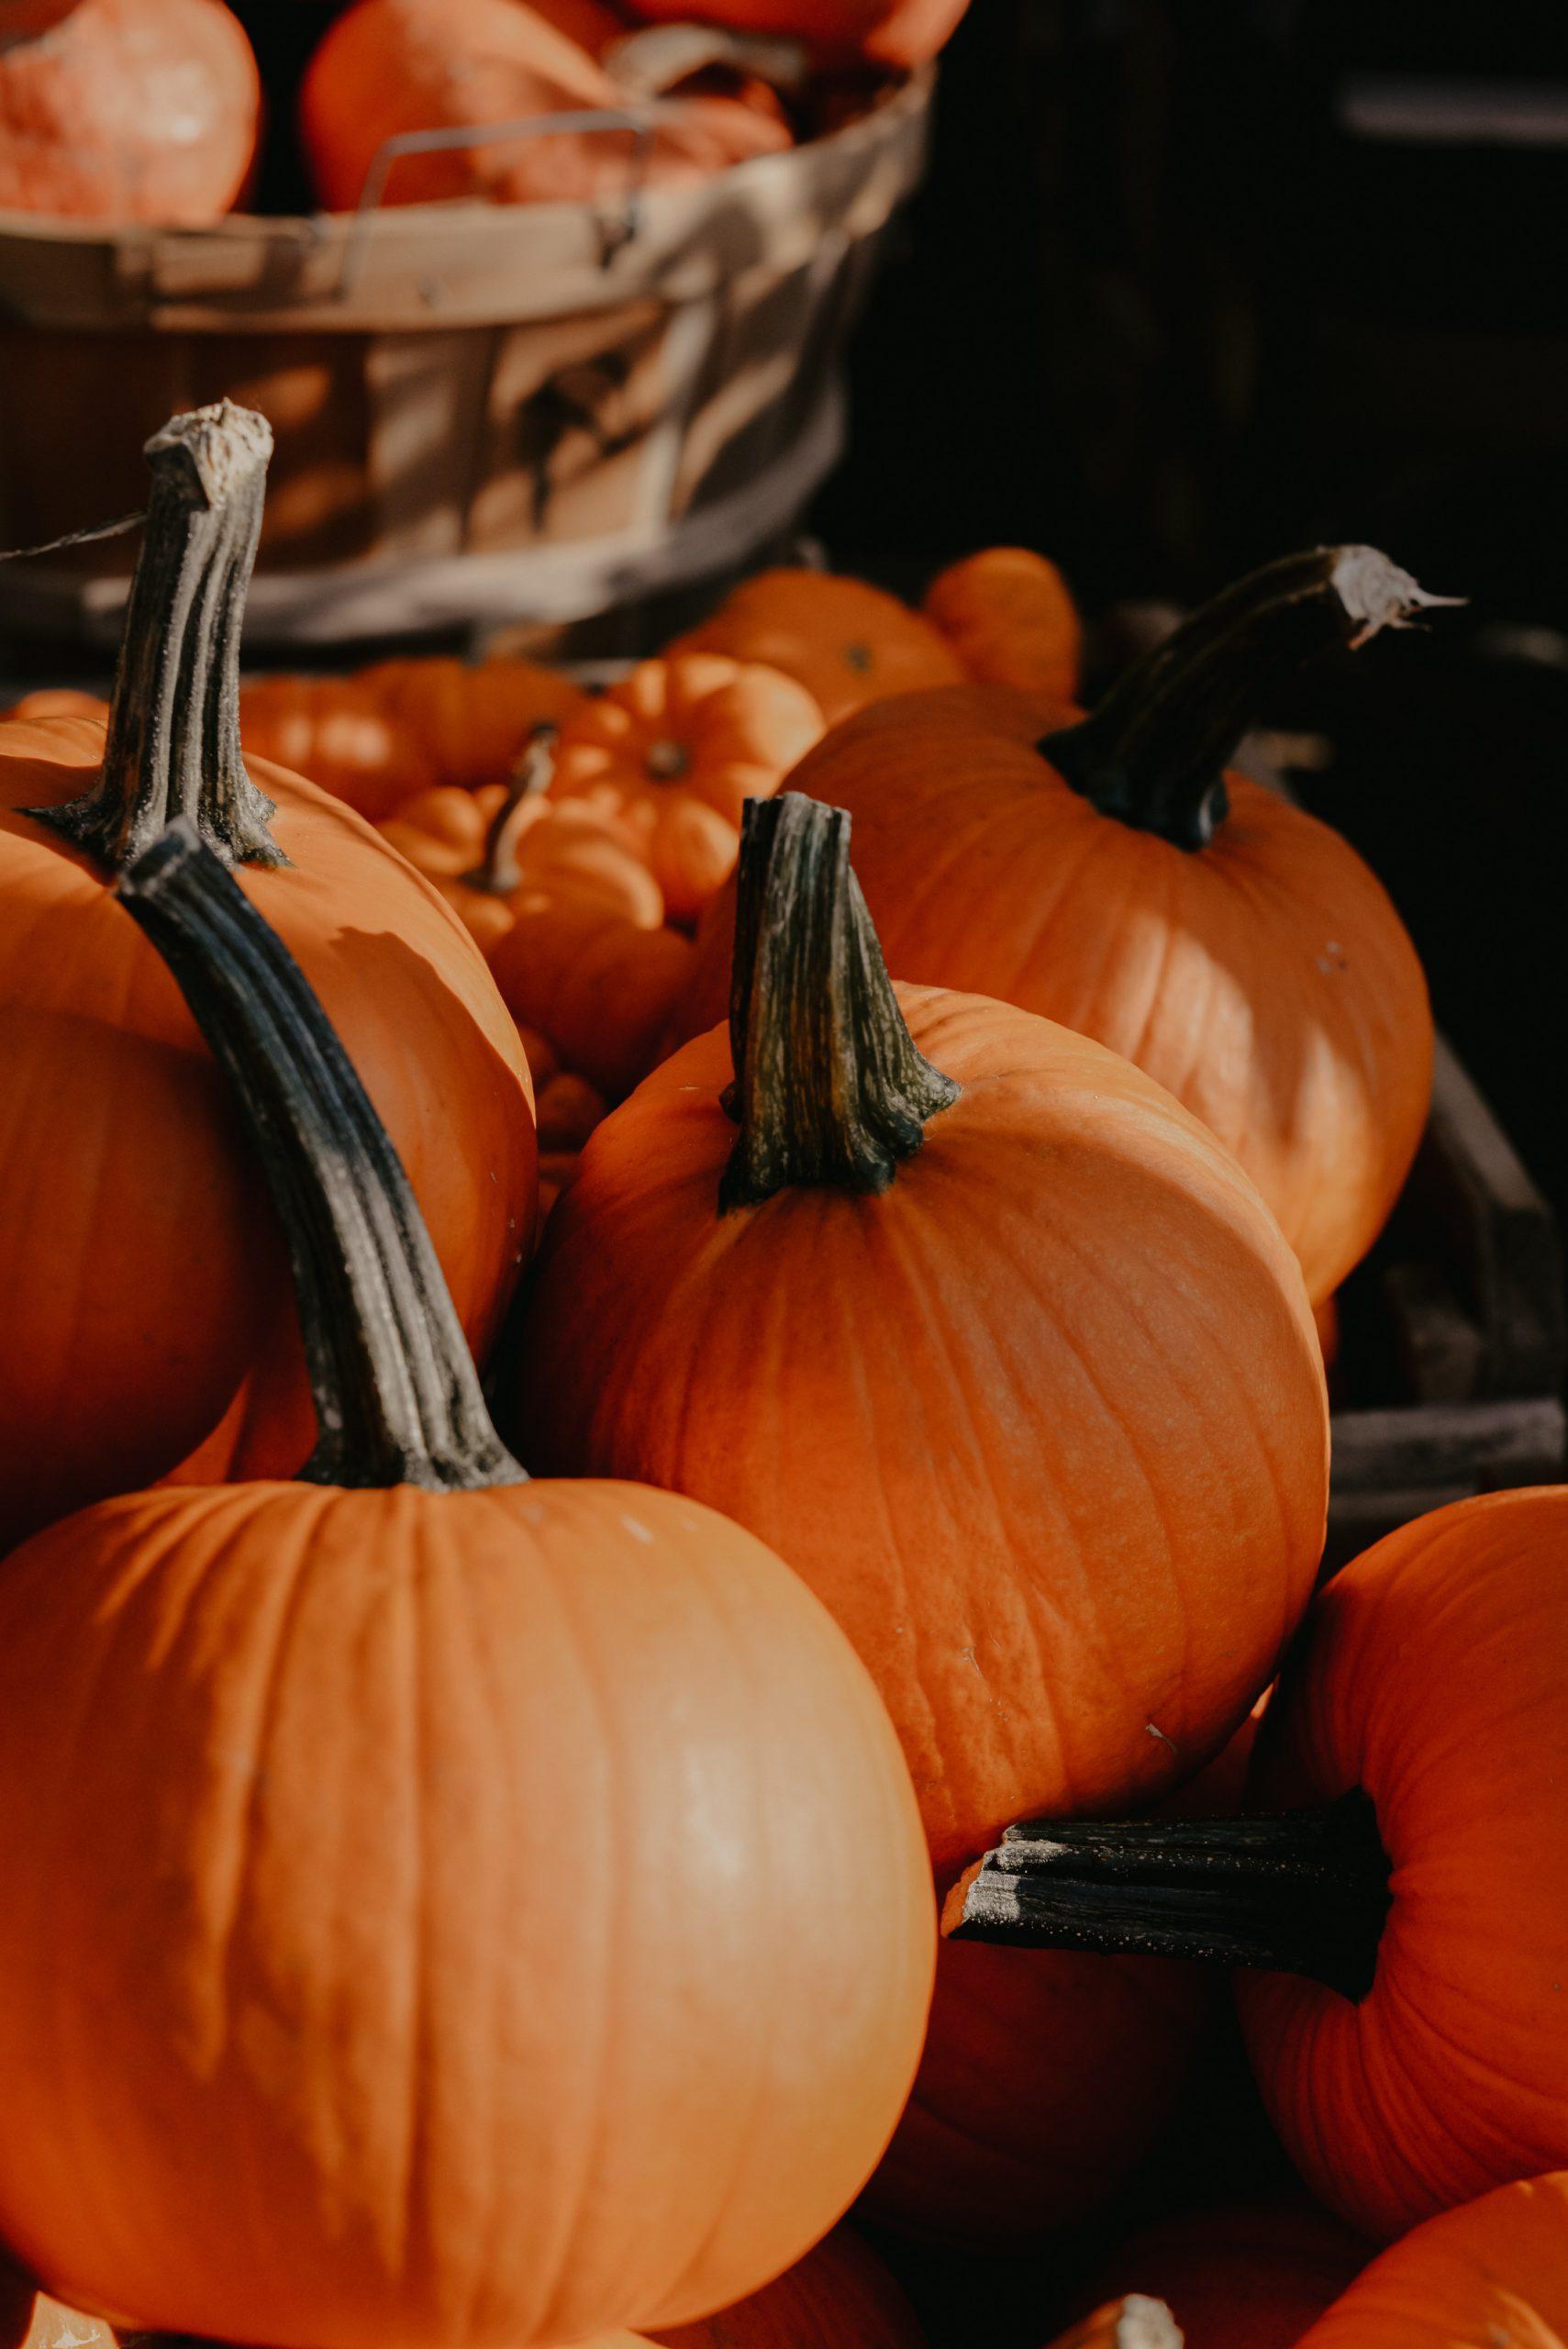 Photo of Pumpkins in Front of Basket